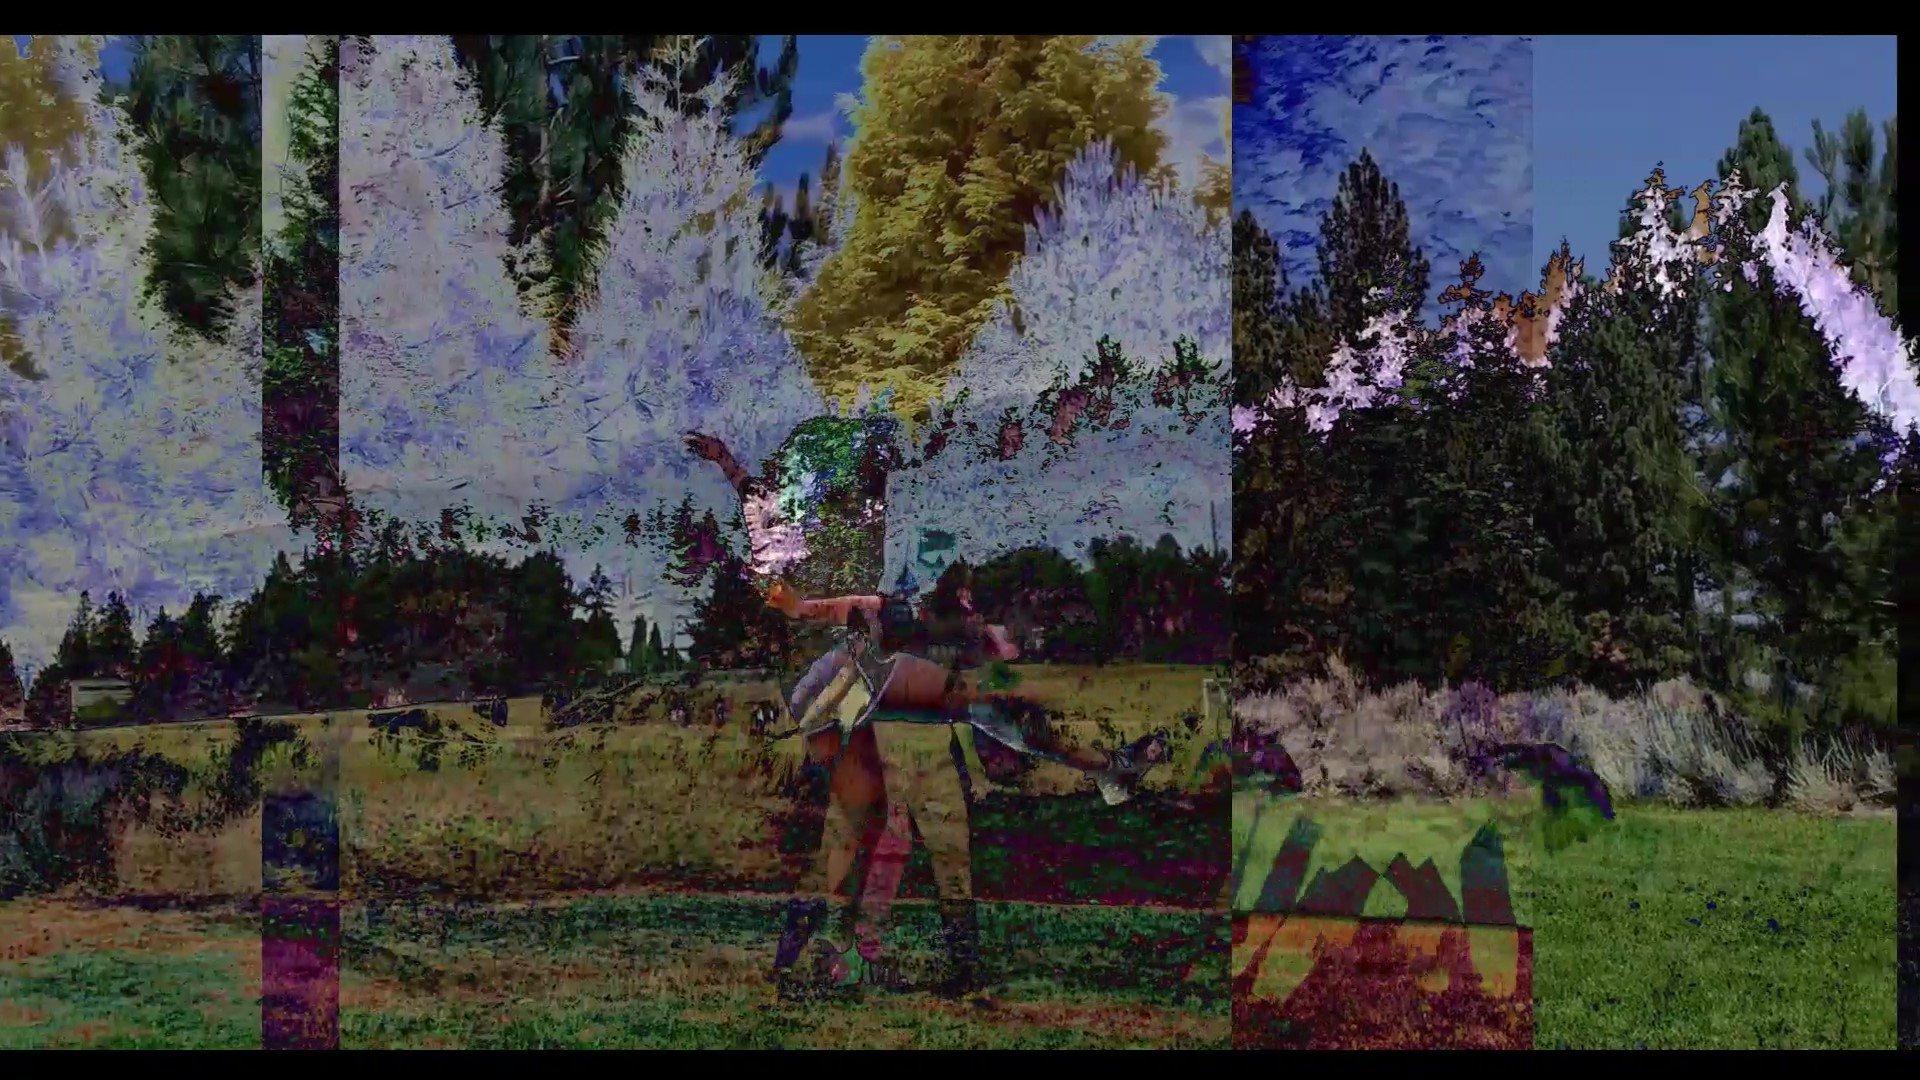 Digitally edited video still with human figures outdoors 1.jpg